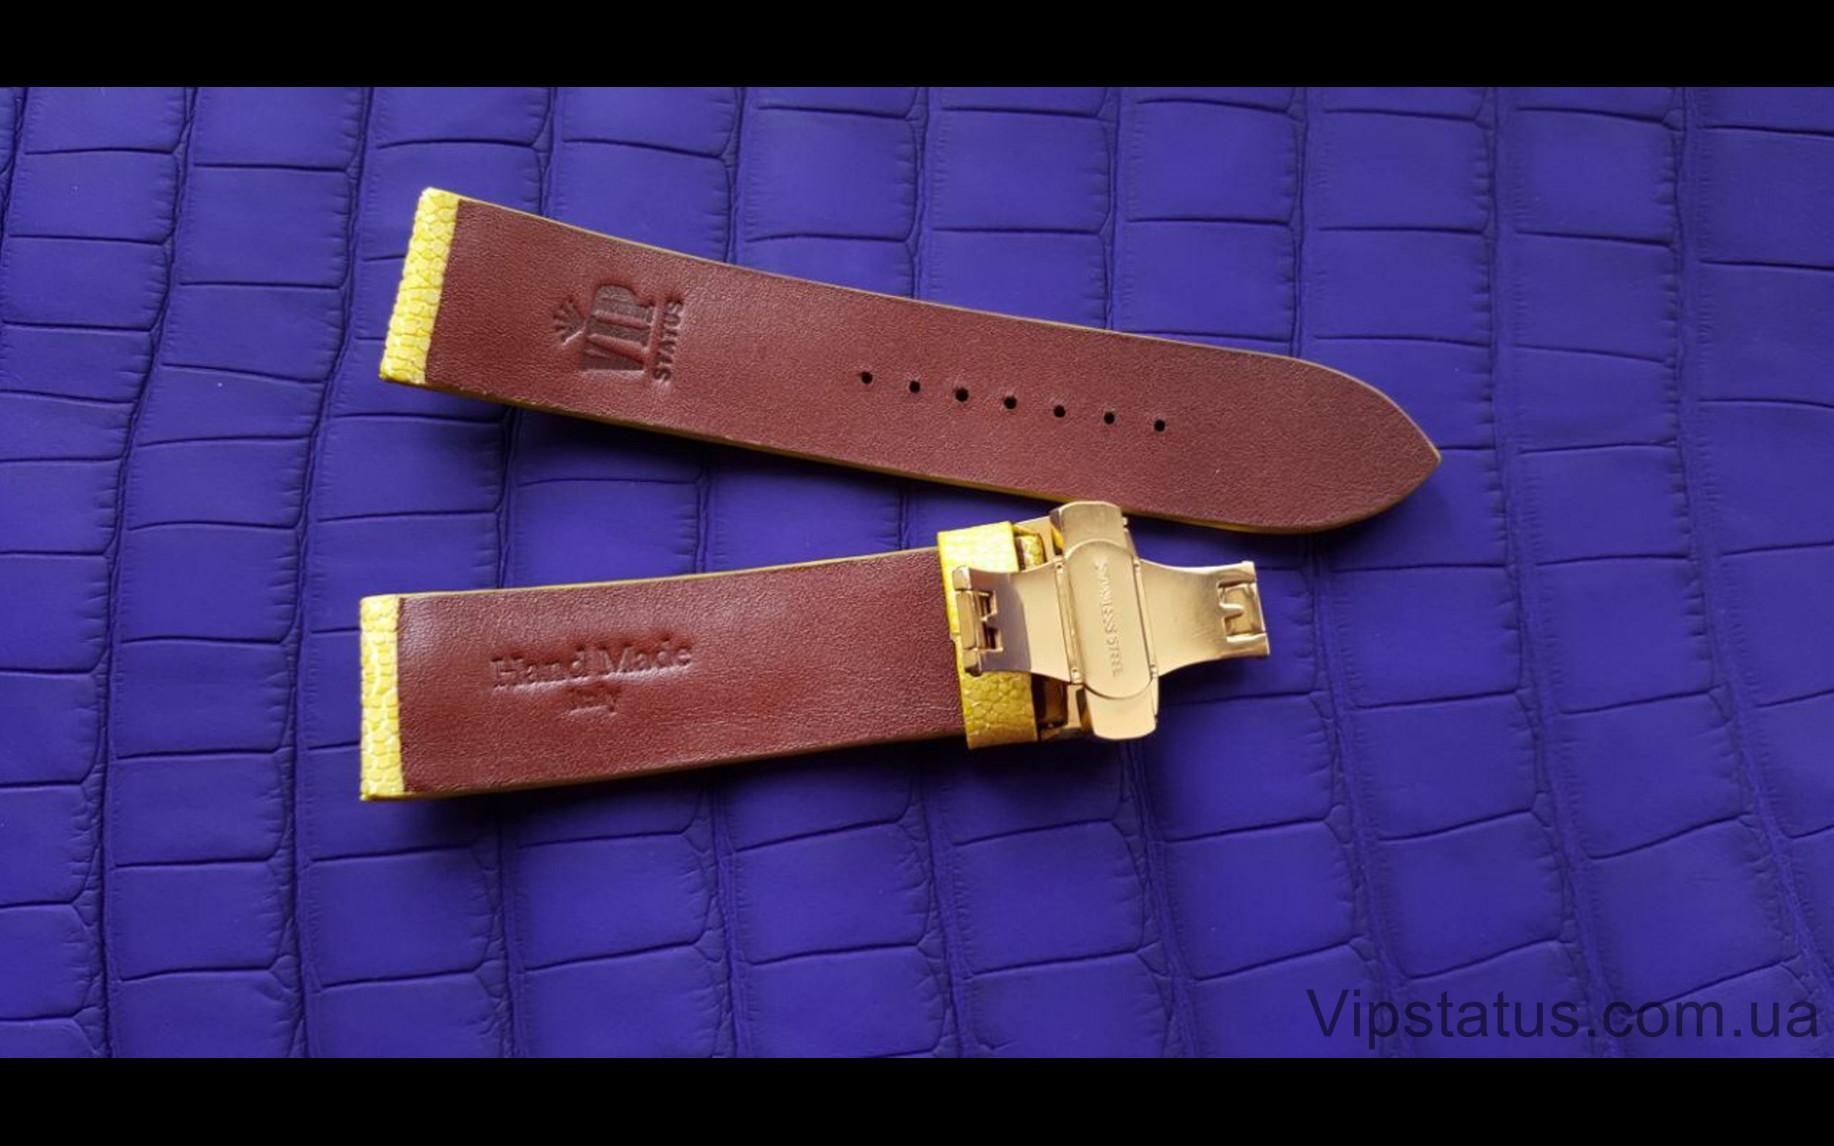 Elite Franck Muller Люксовый ремешок кожа ската Franck Muller Luxury Stingray Leather Strap image 2